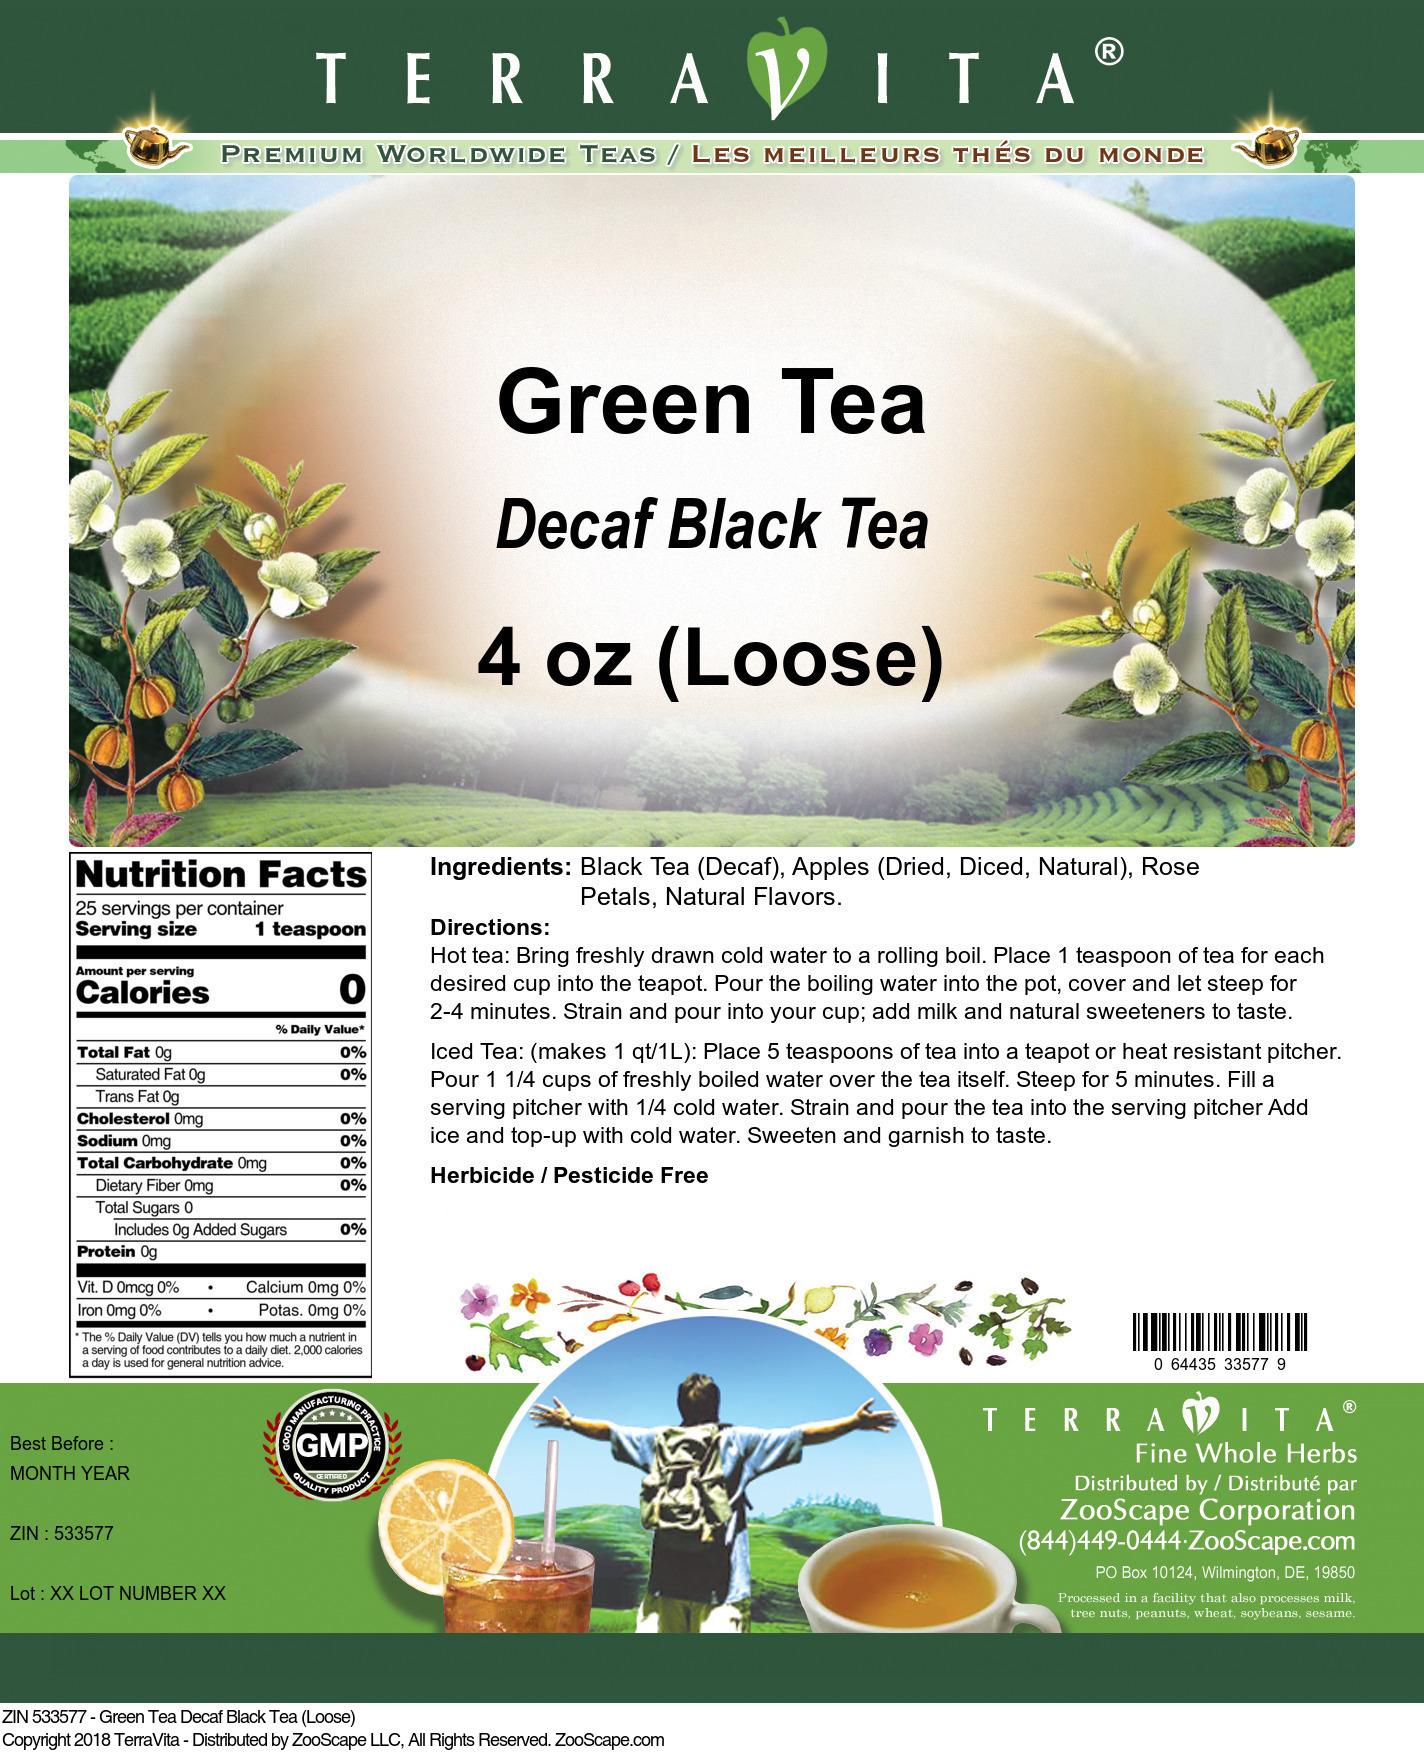 Green Tea Decaf Black Tea (Loose)